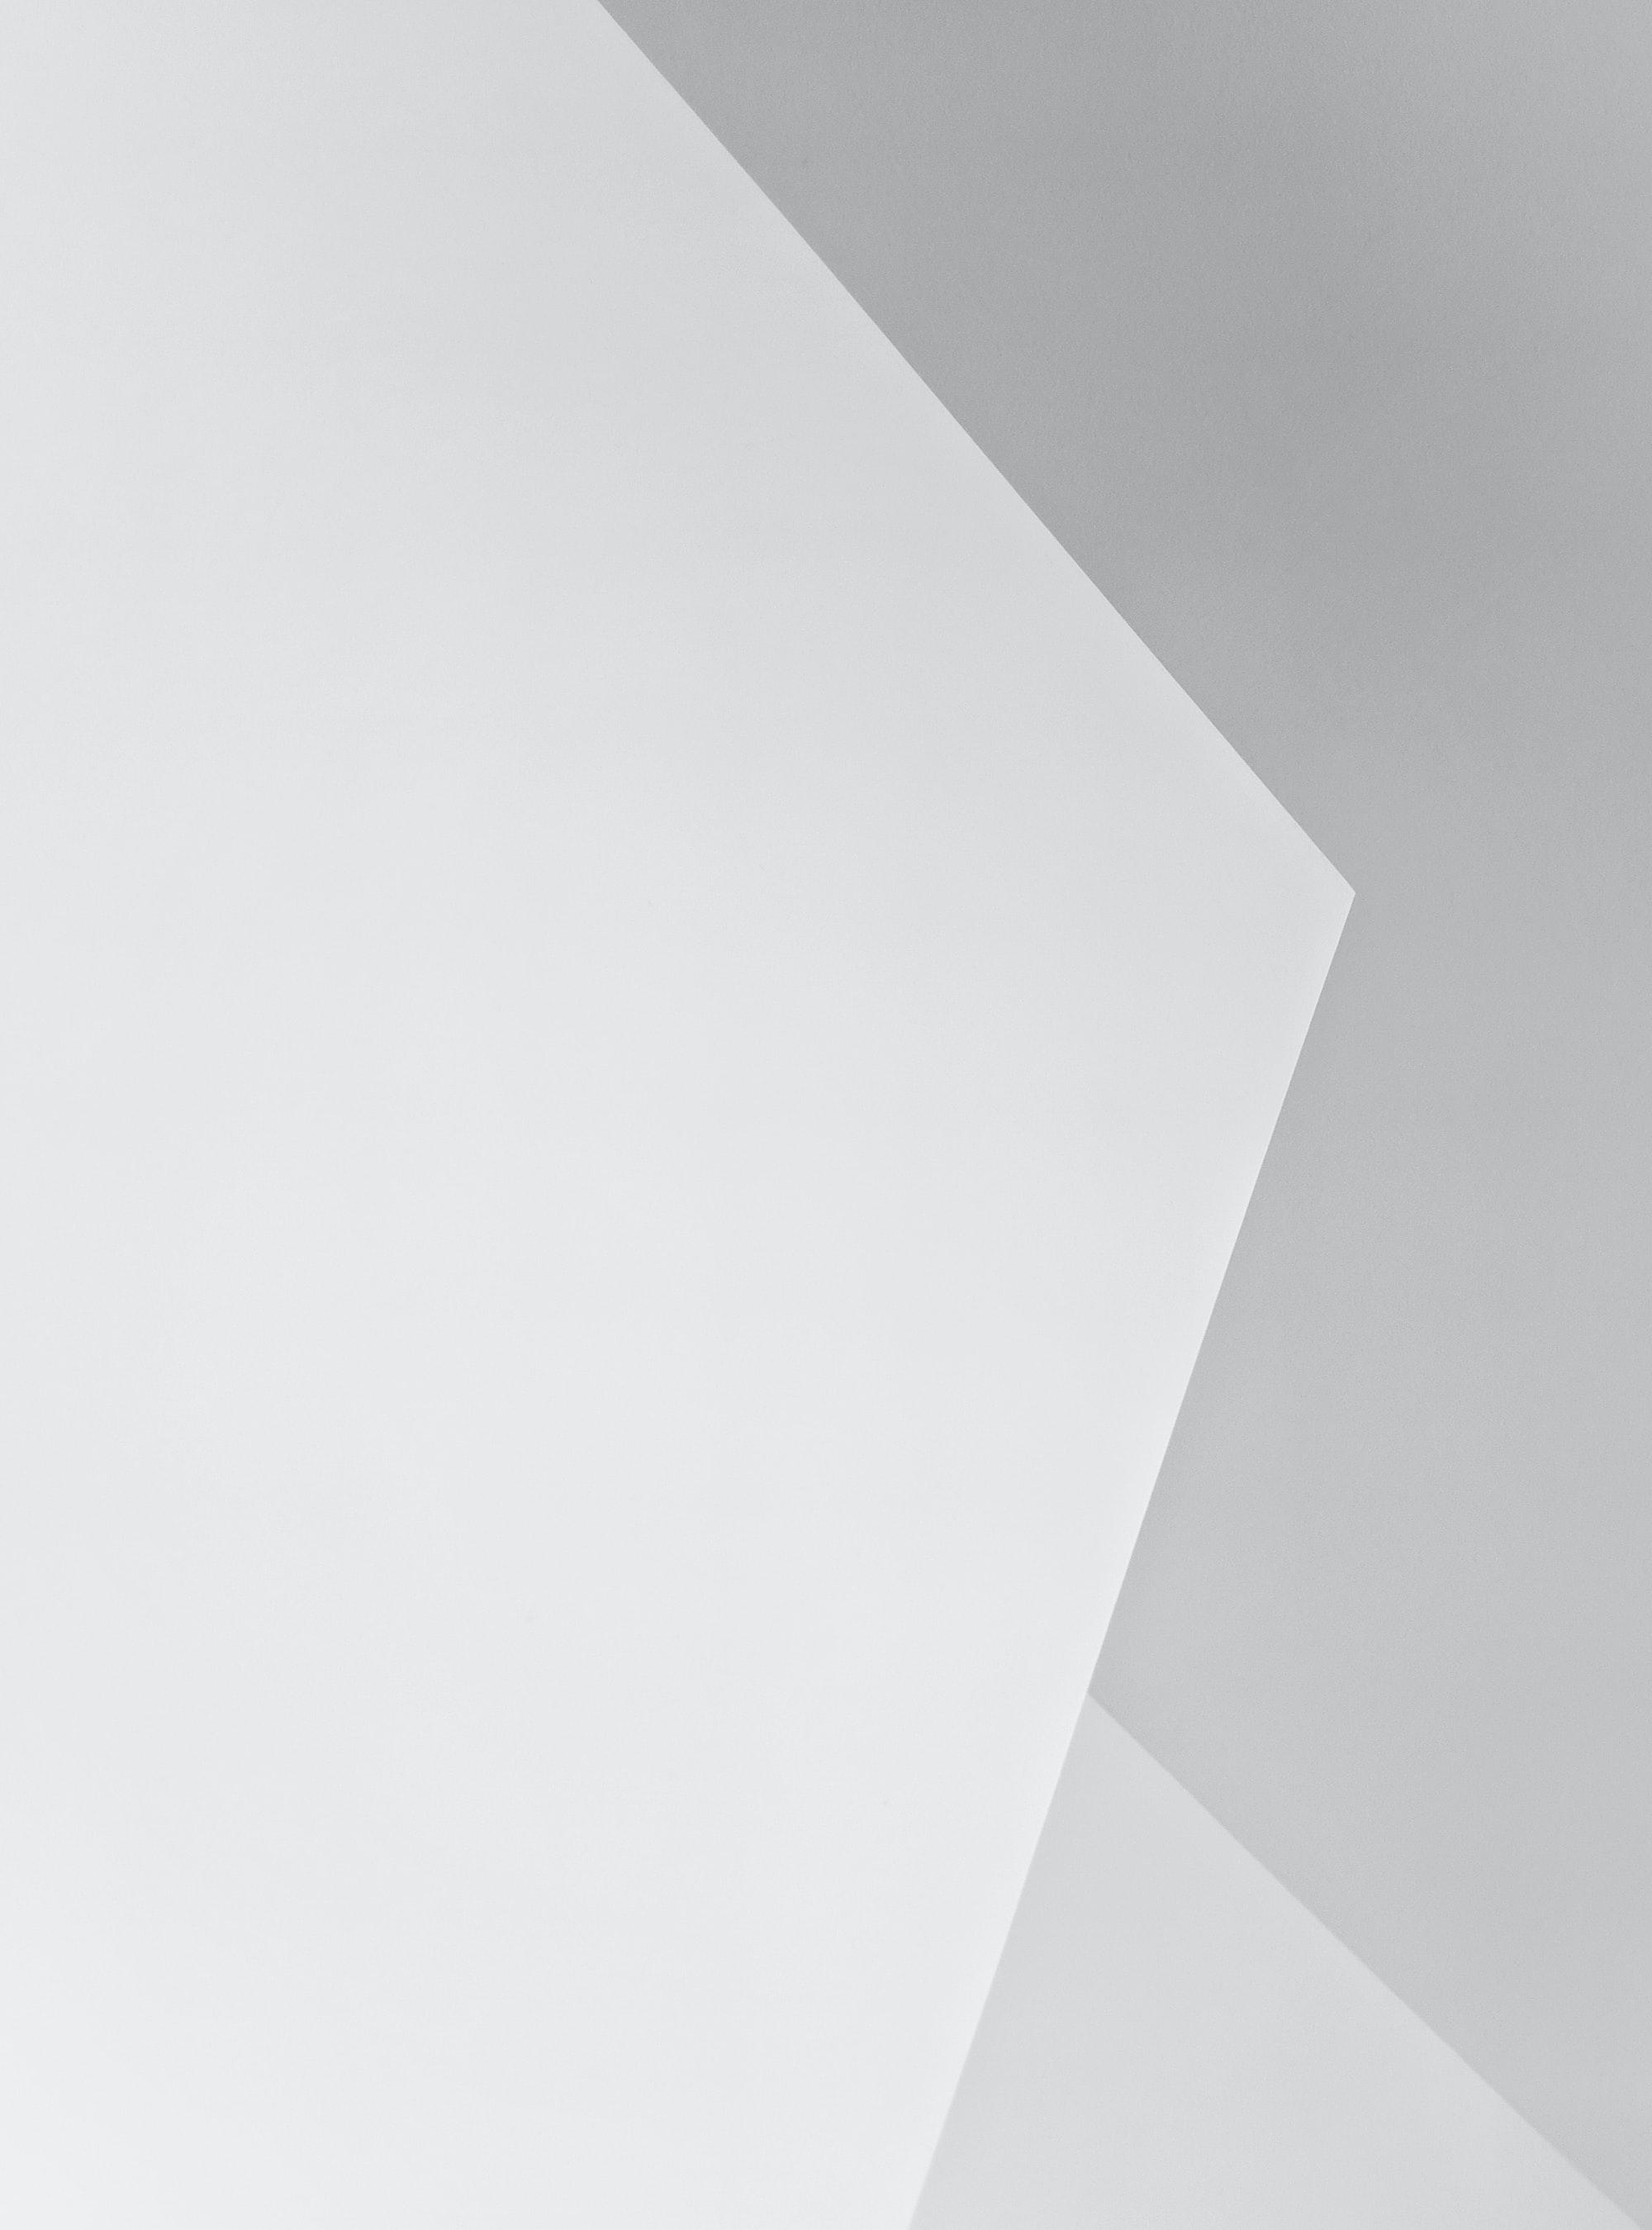 CSS: Why is dark grey lighter than regular grey?